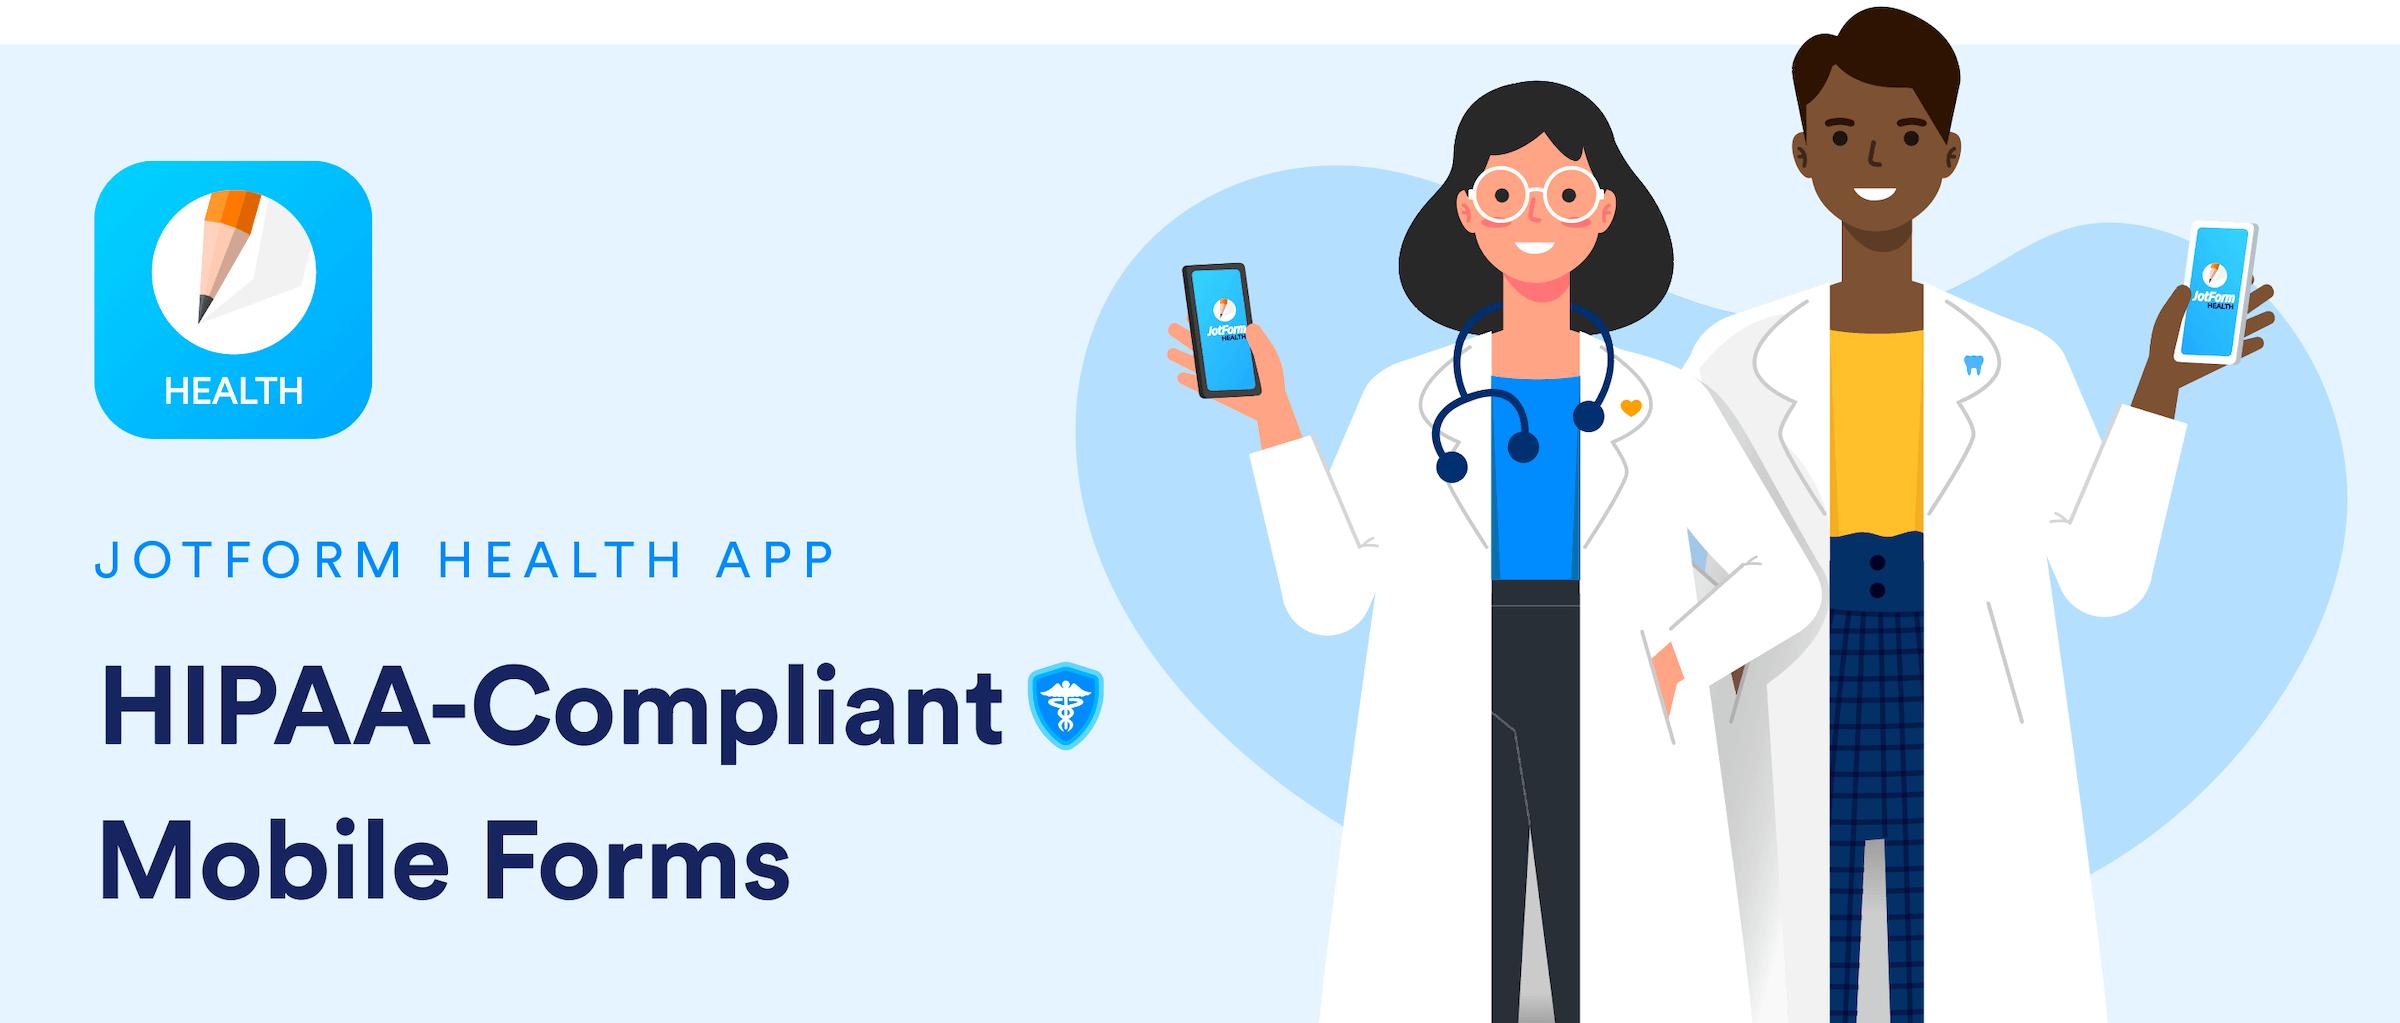 Announcing the new JotForm Health app